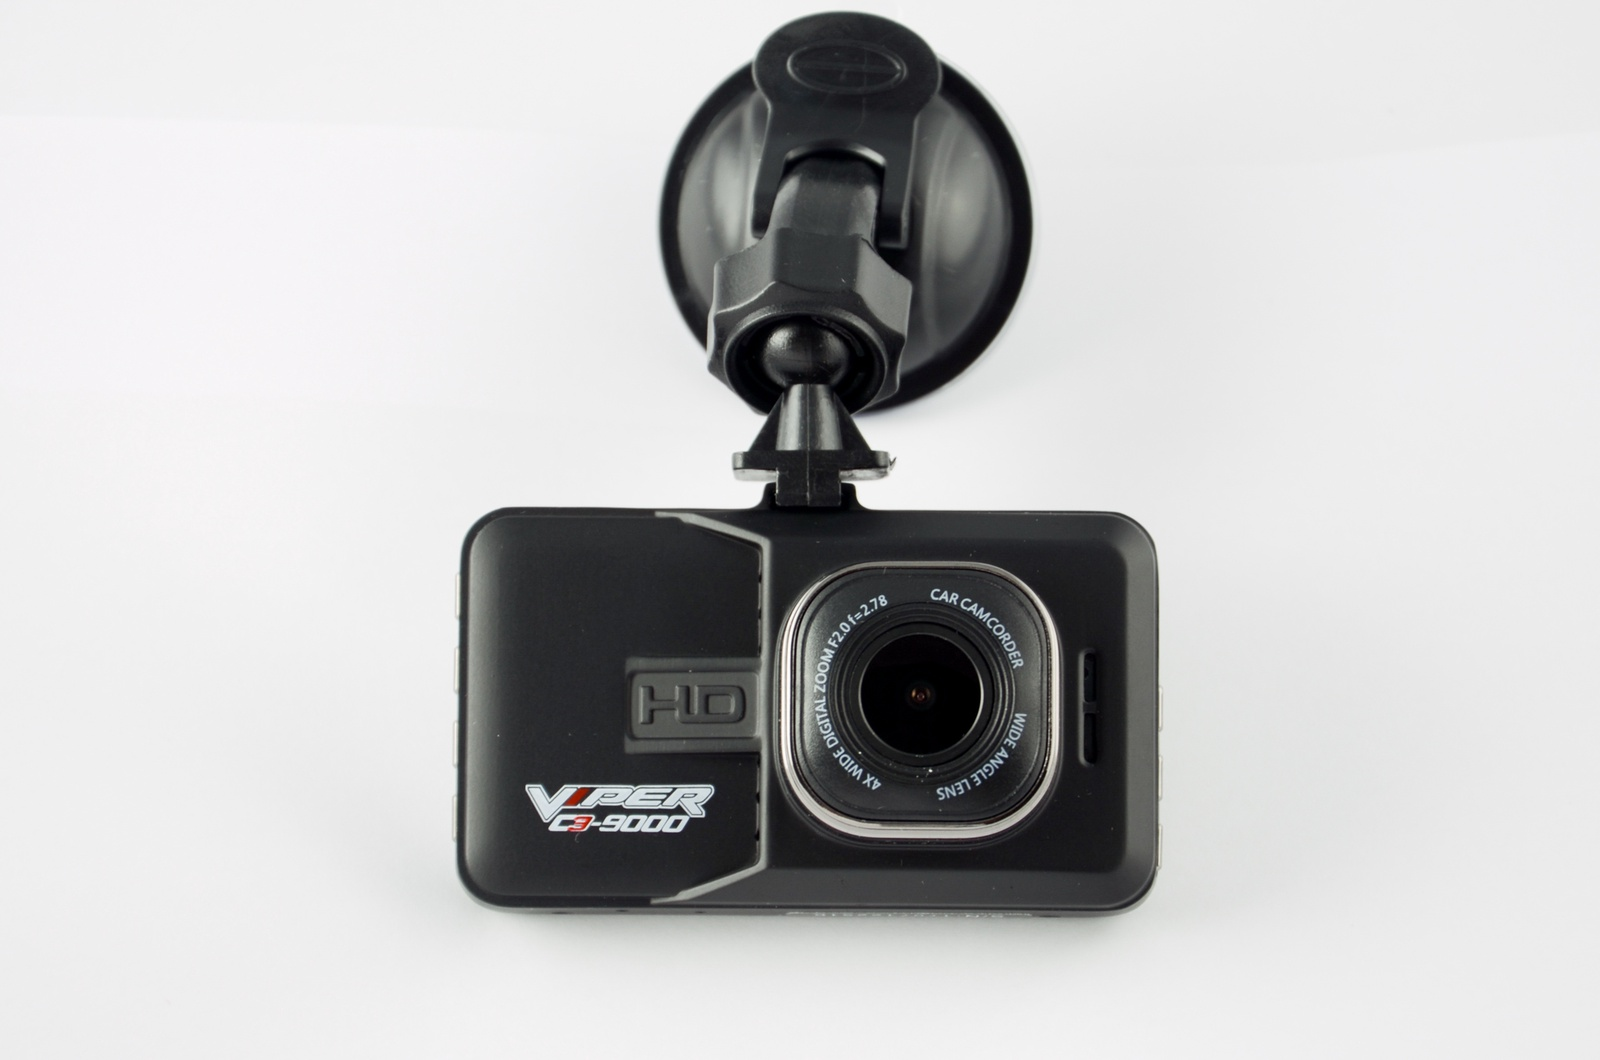 Видеорегистратор Viper C3-9000 Viper